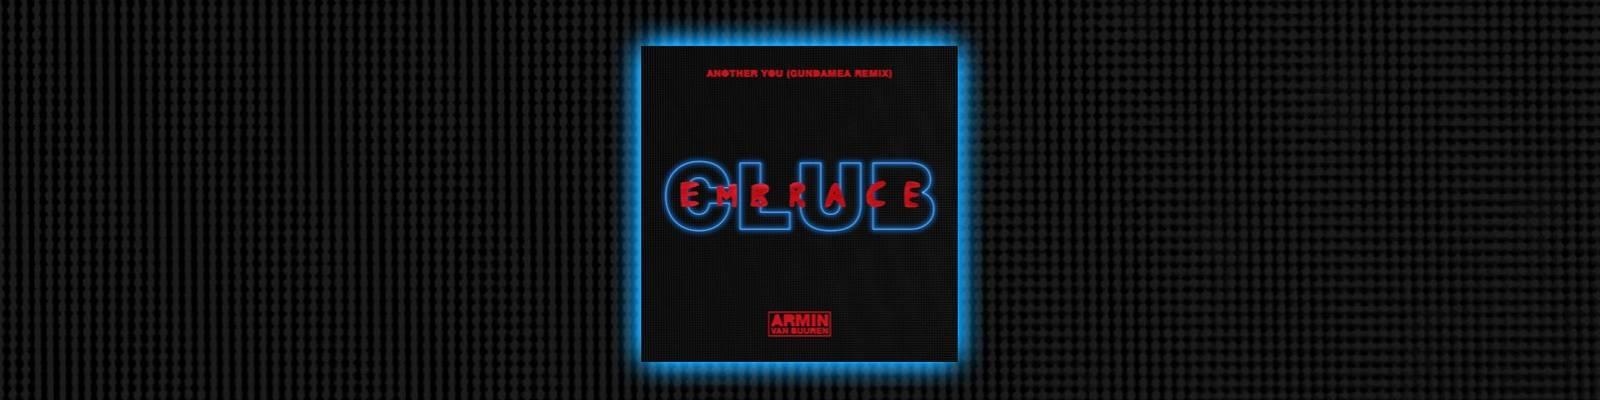 OUT NOW on Armind: Armin van Buuren feat. Mr. Probz – Another You (Gundamea Remix)